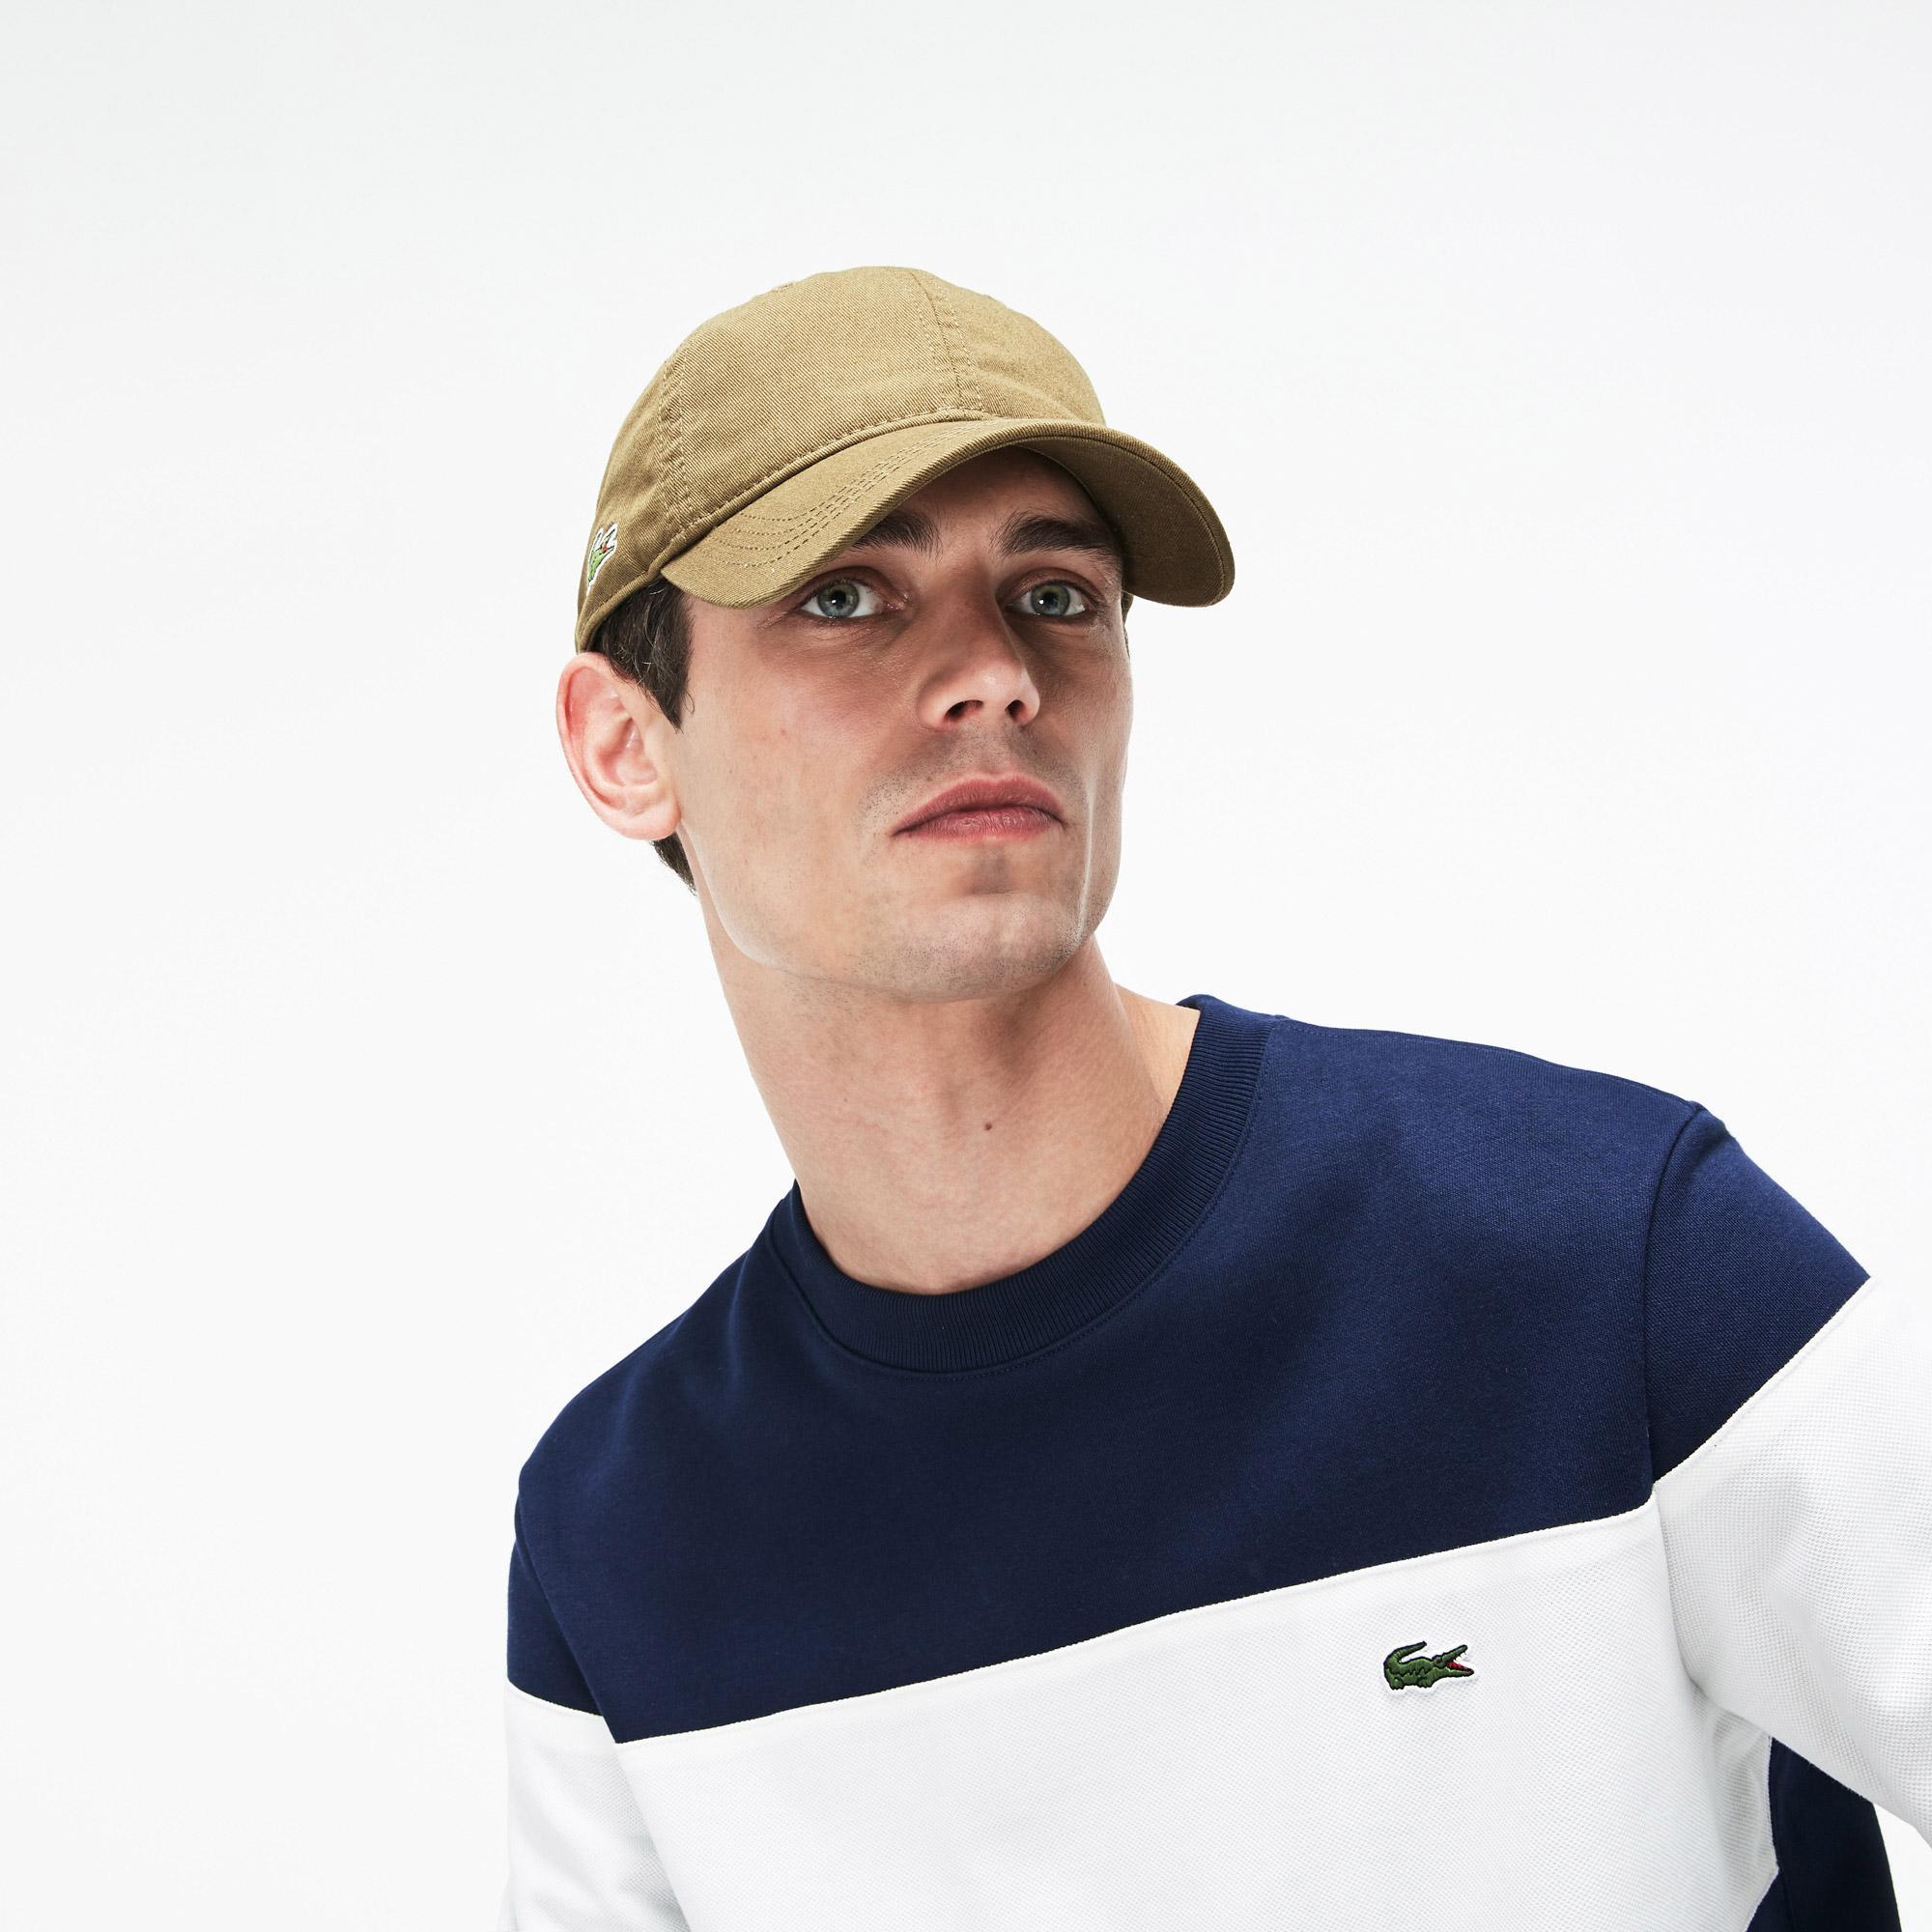 Lacoste Haki Şapka